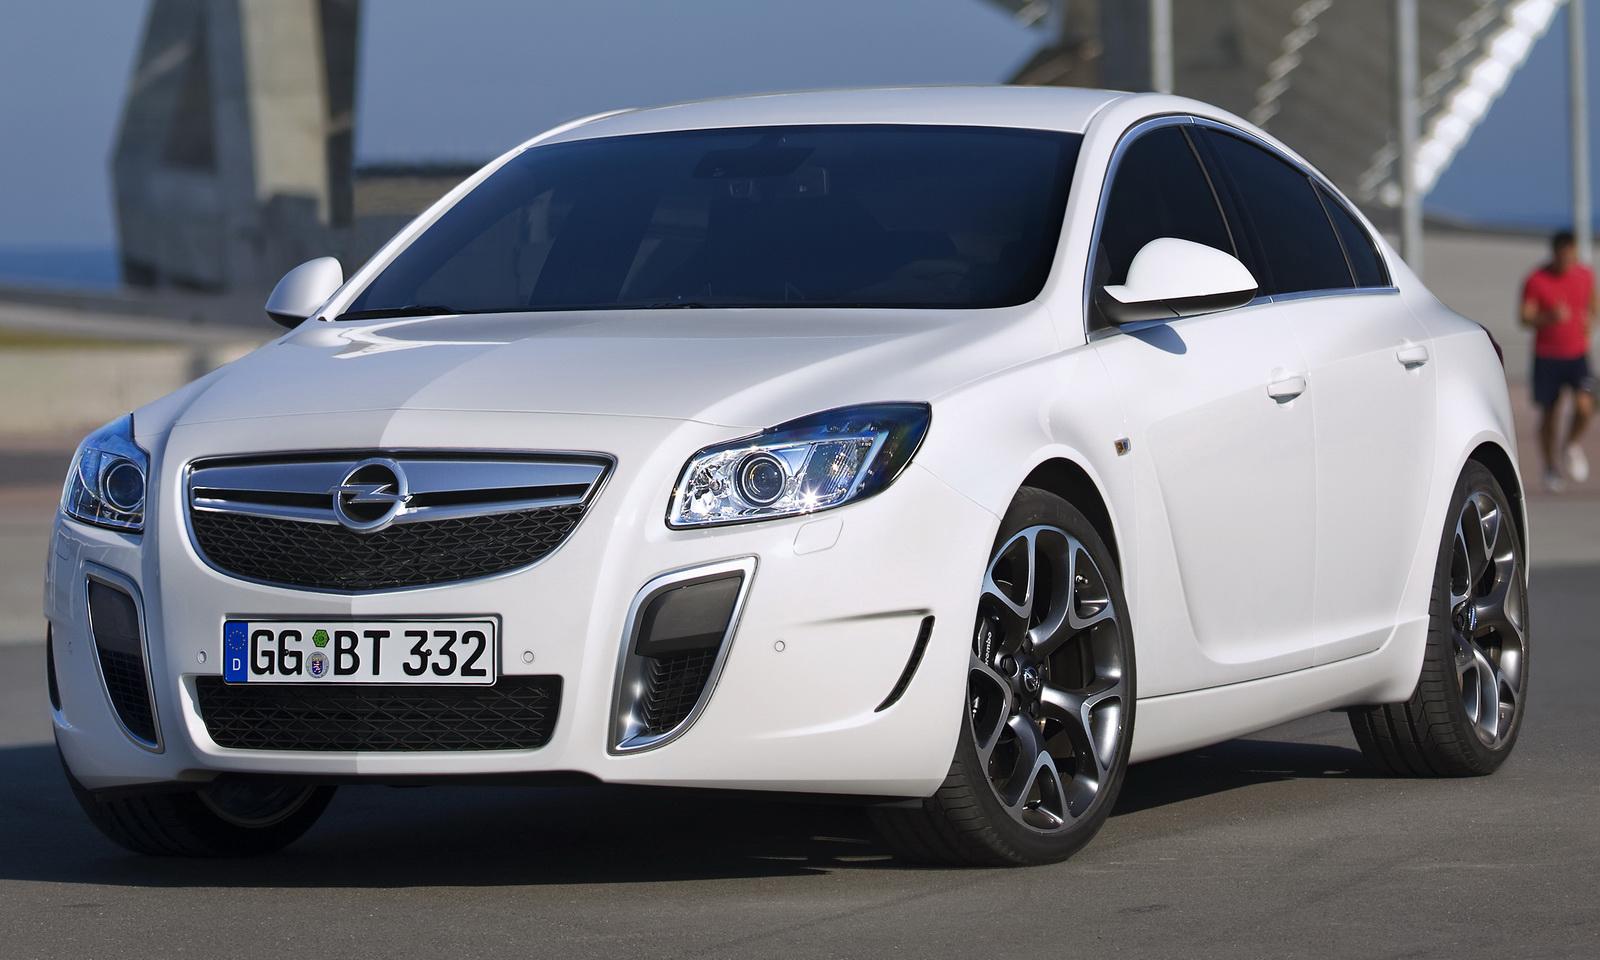 Opel Insignia Facelift image Desktop Backgrounds